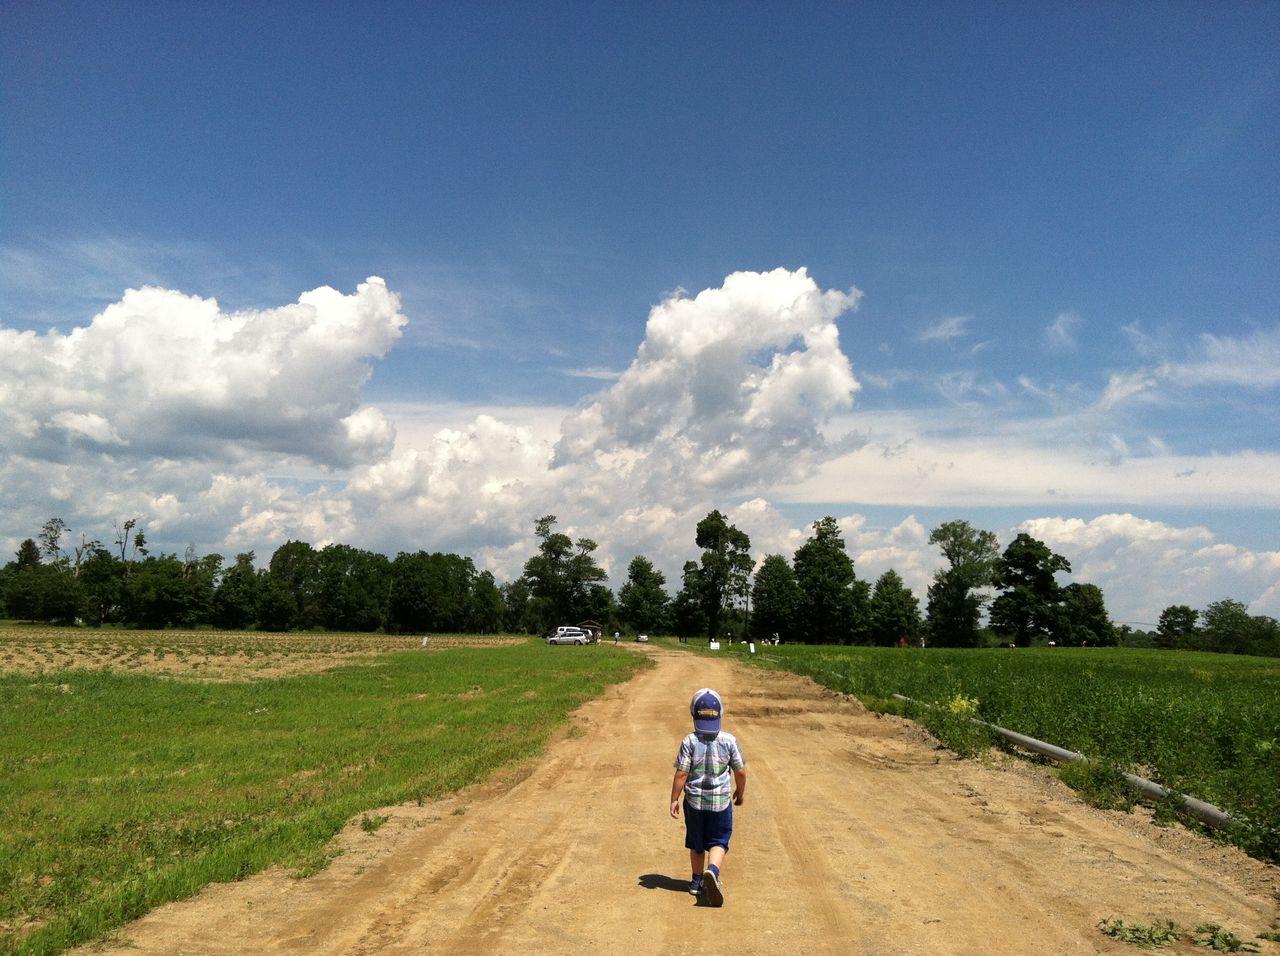 Rear view full length of boy walking amidst grassy field on dirt road